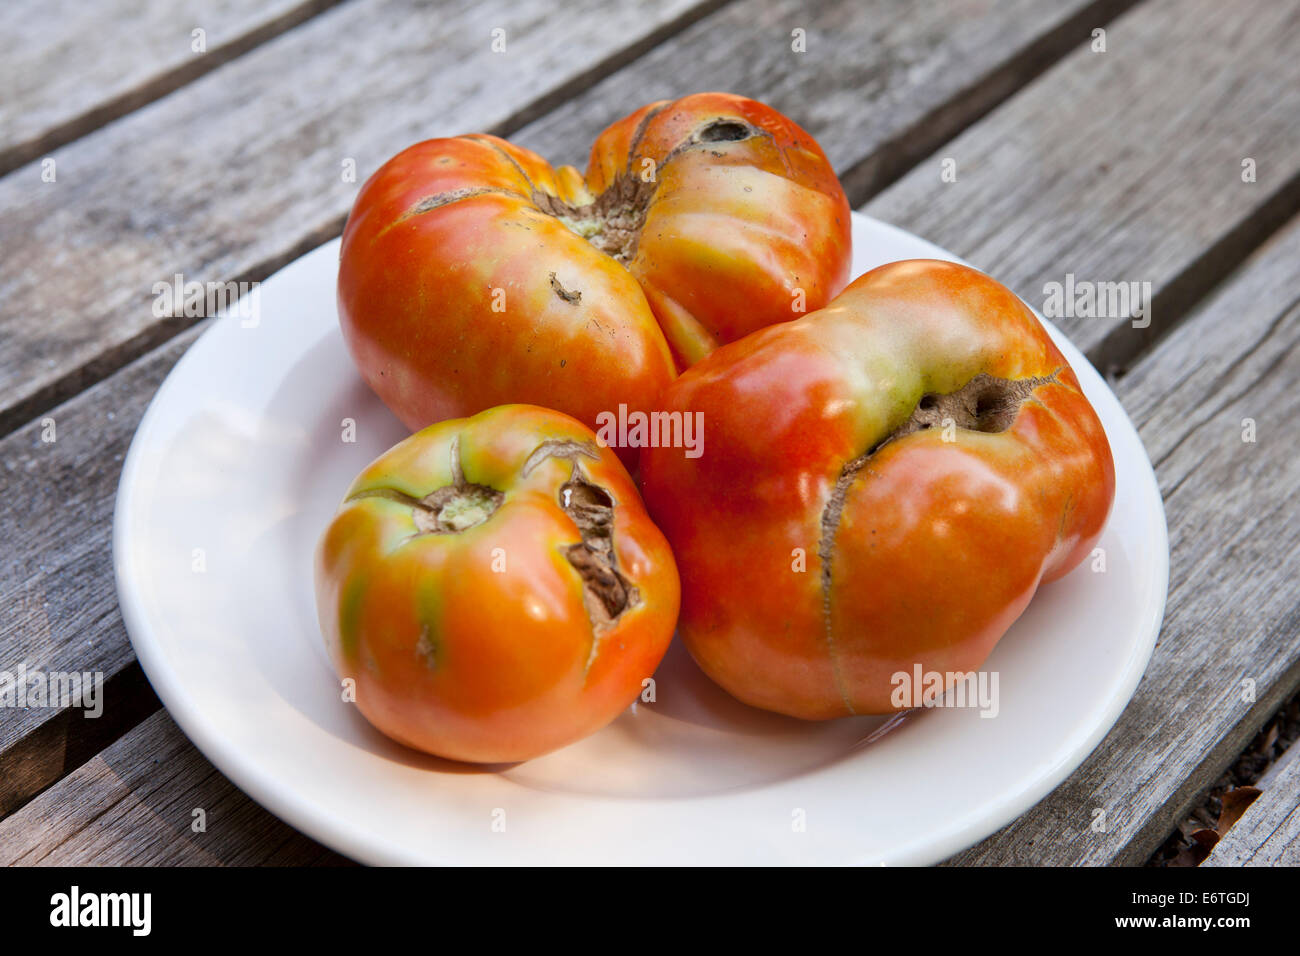 Zippering damaged tomatoes on dish - USA - Stock Image